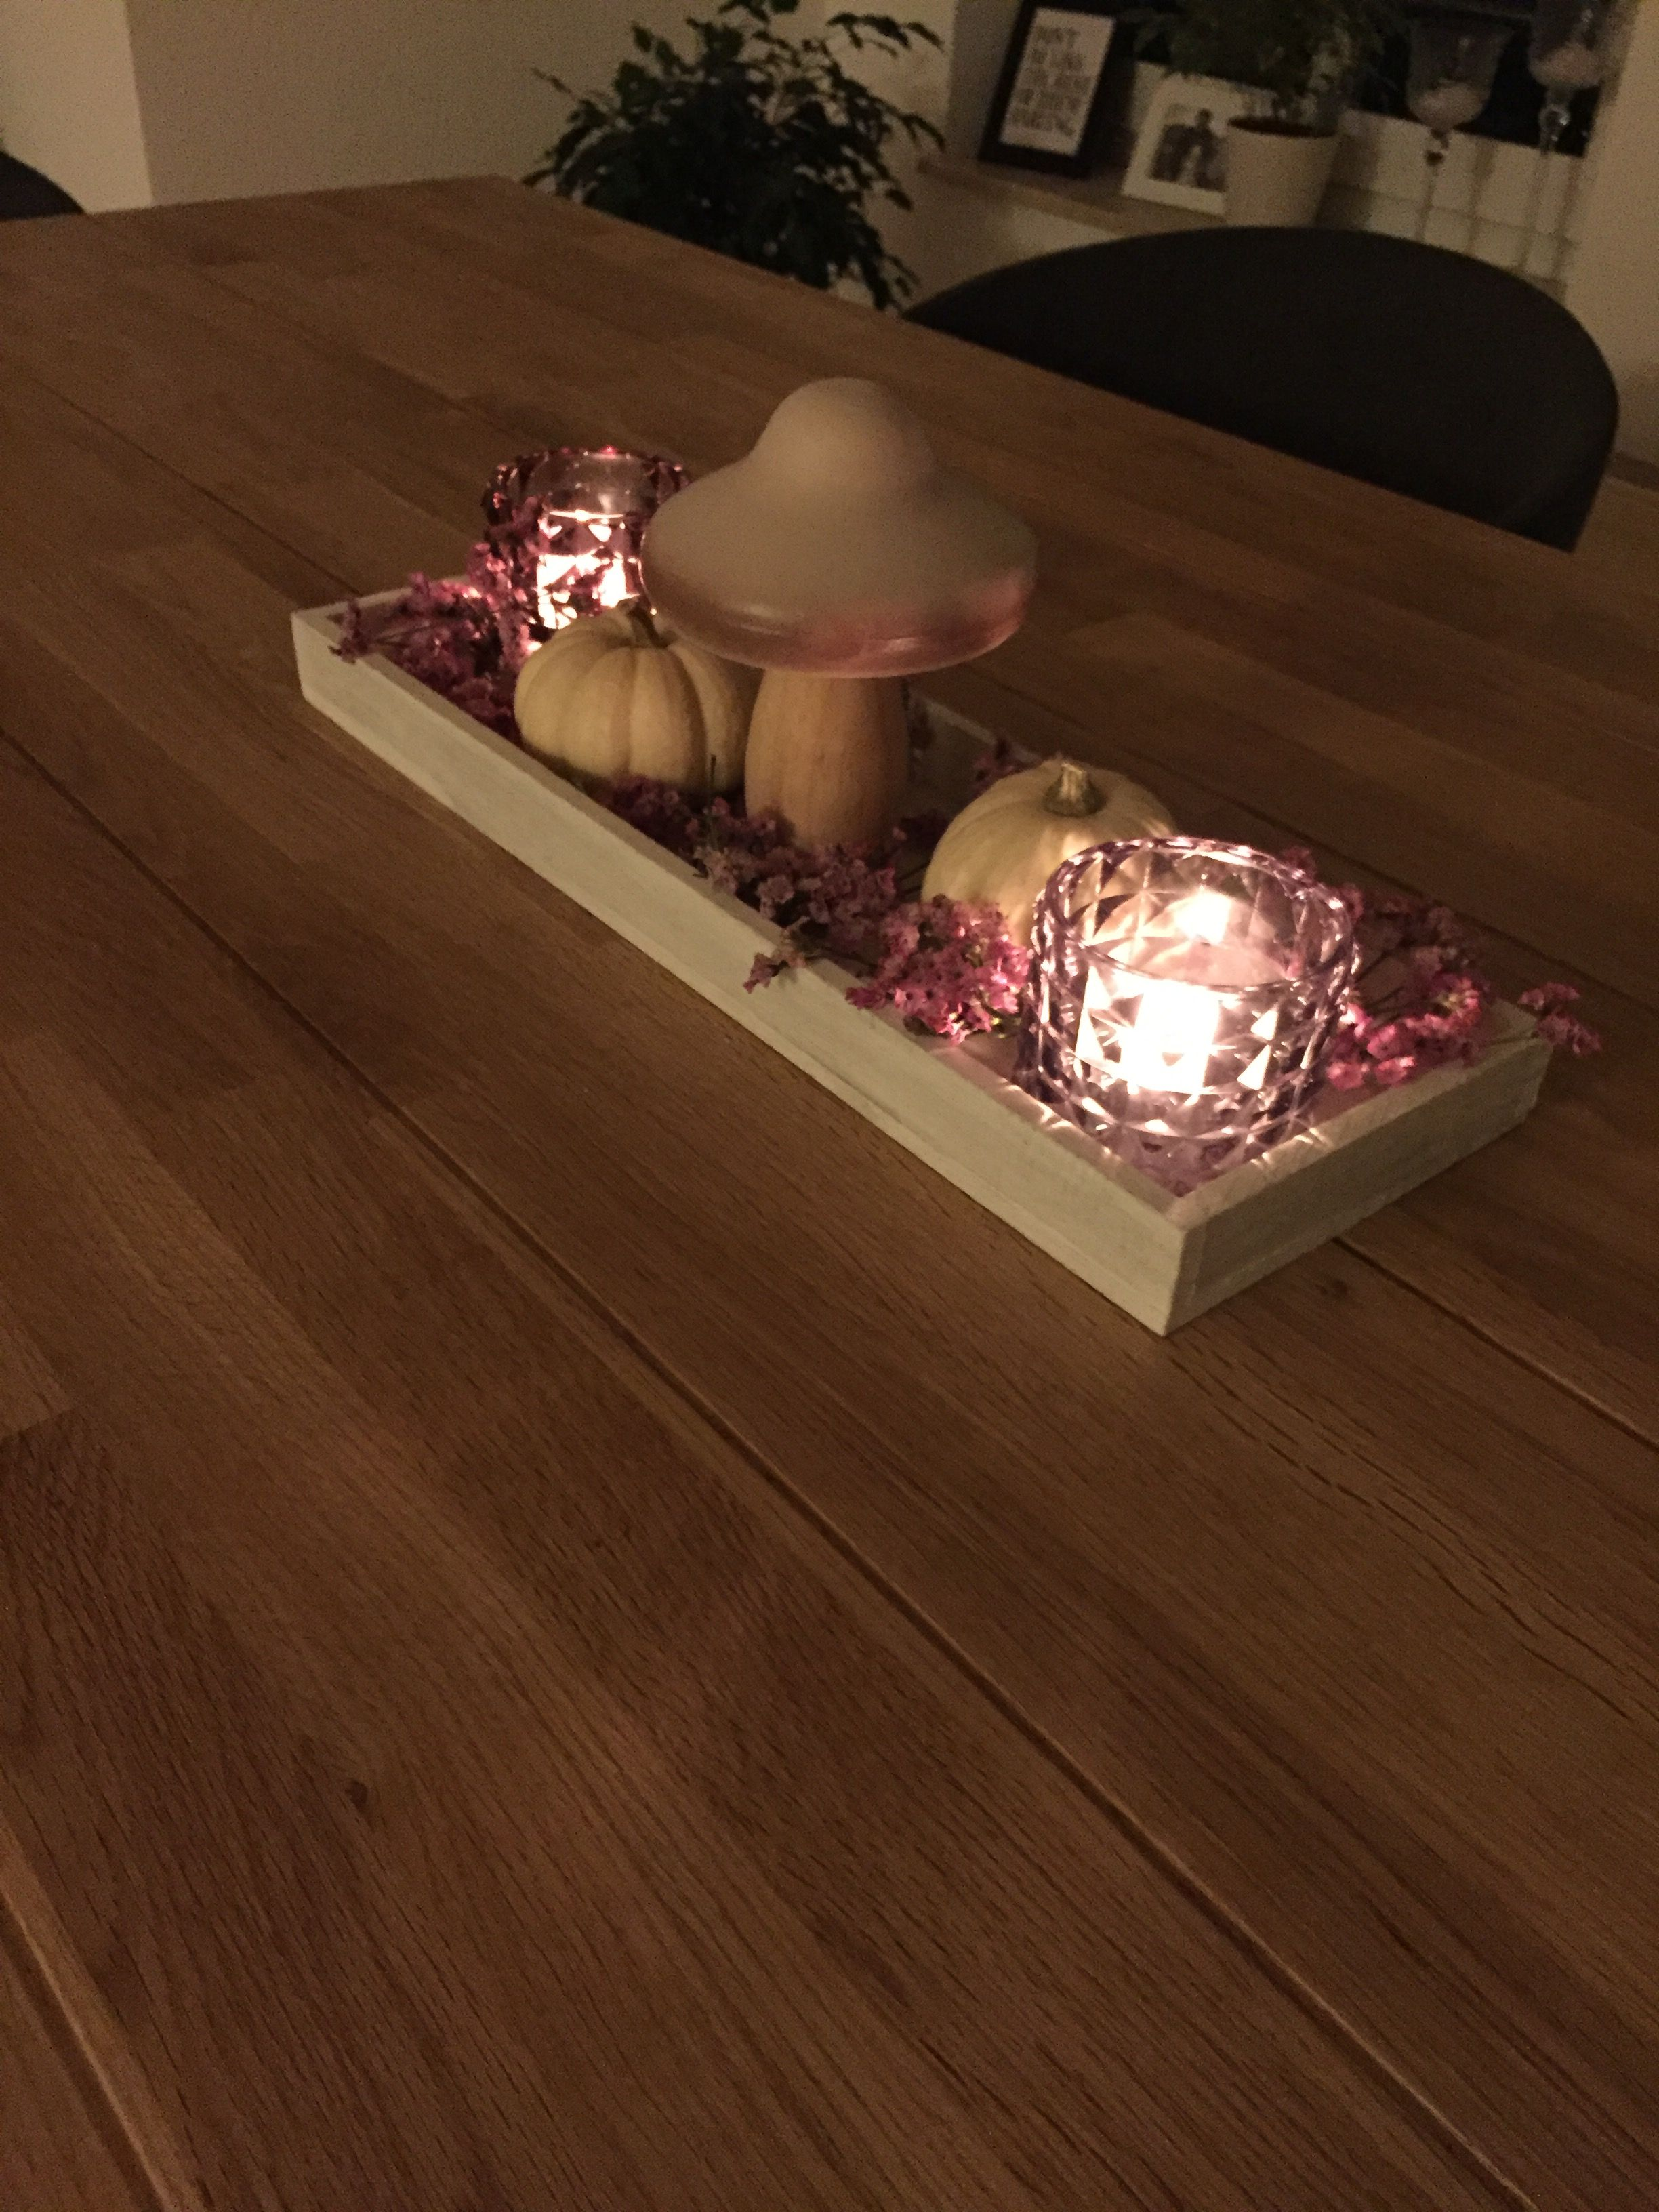 Rosa Herbstdeko #herbstdekotischtablett